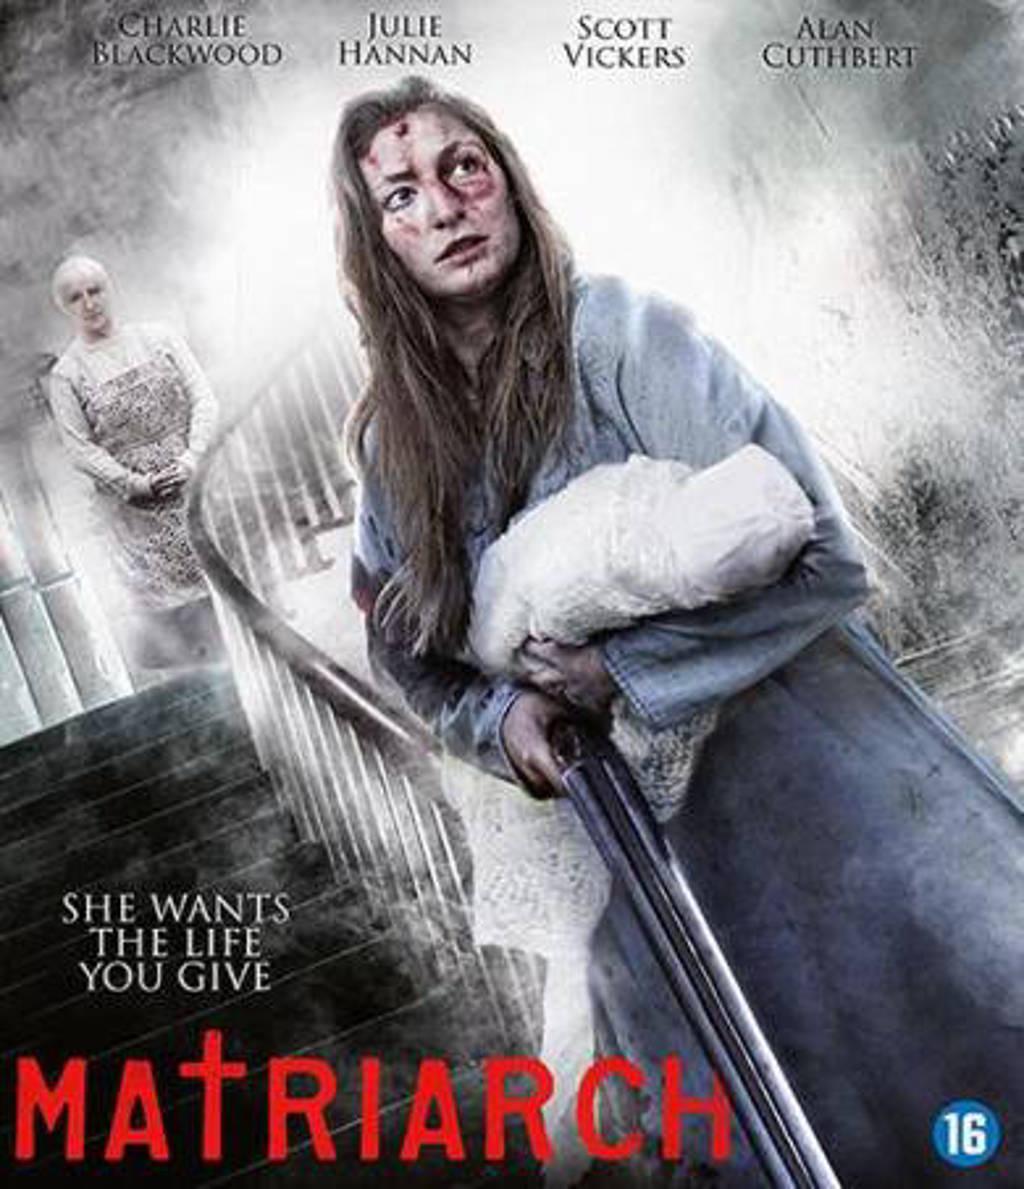 Matriarch (Blu-ray)